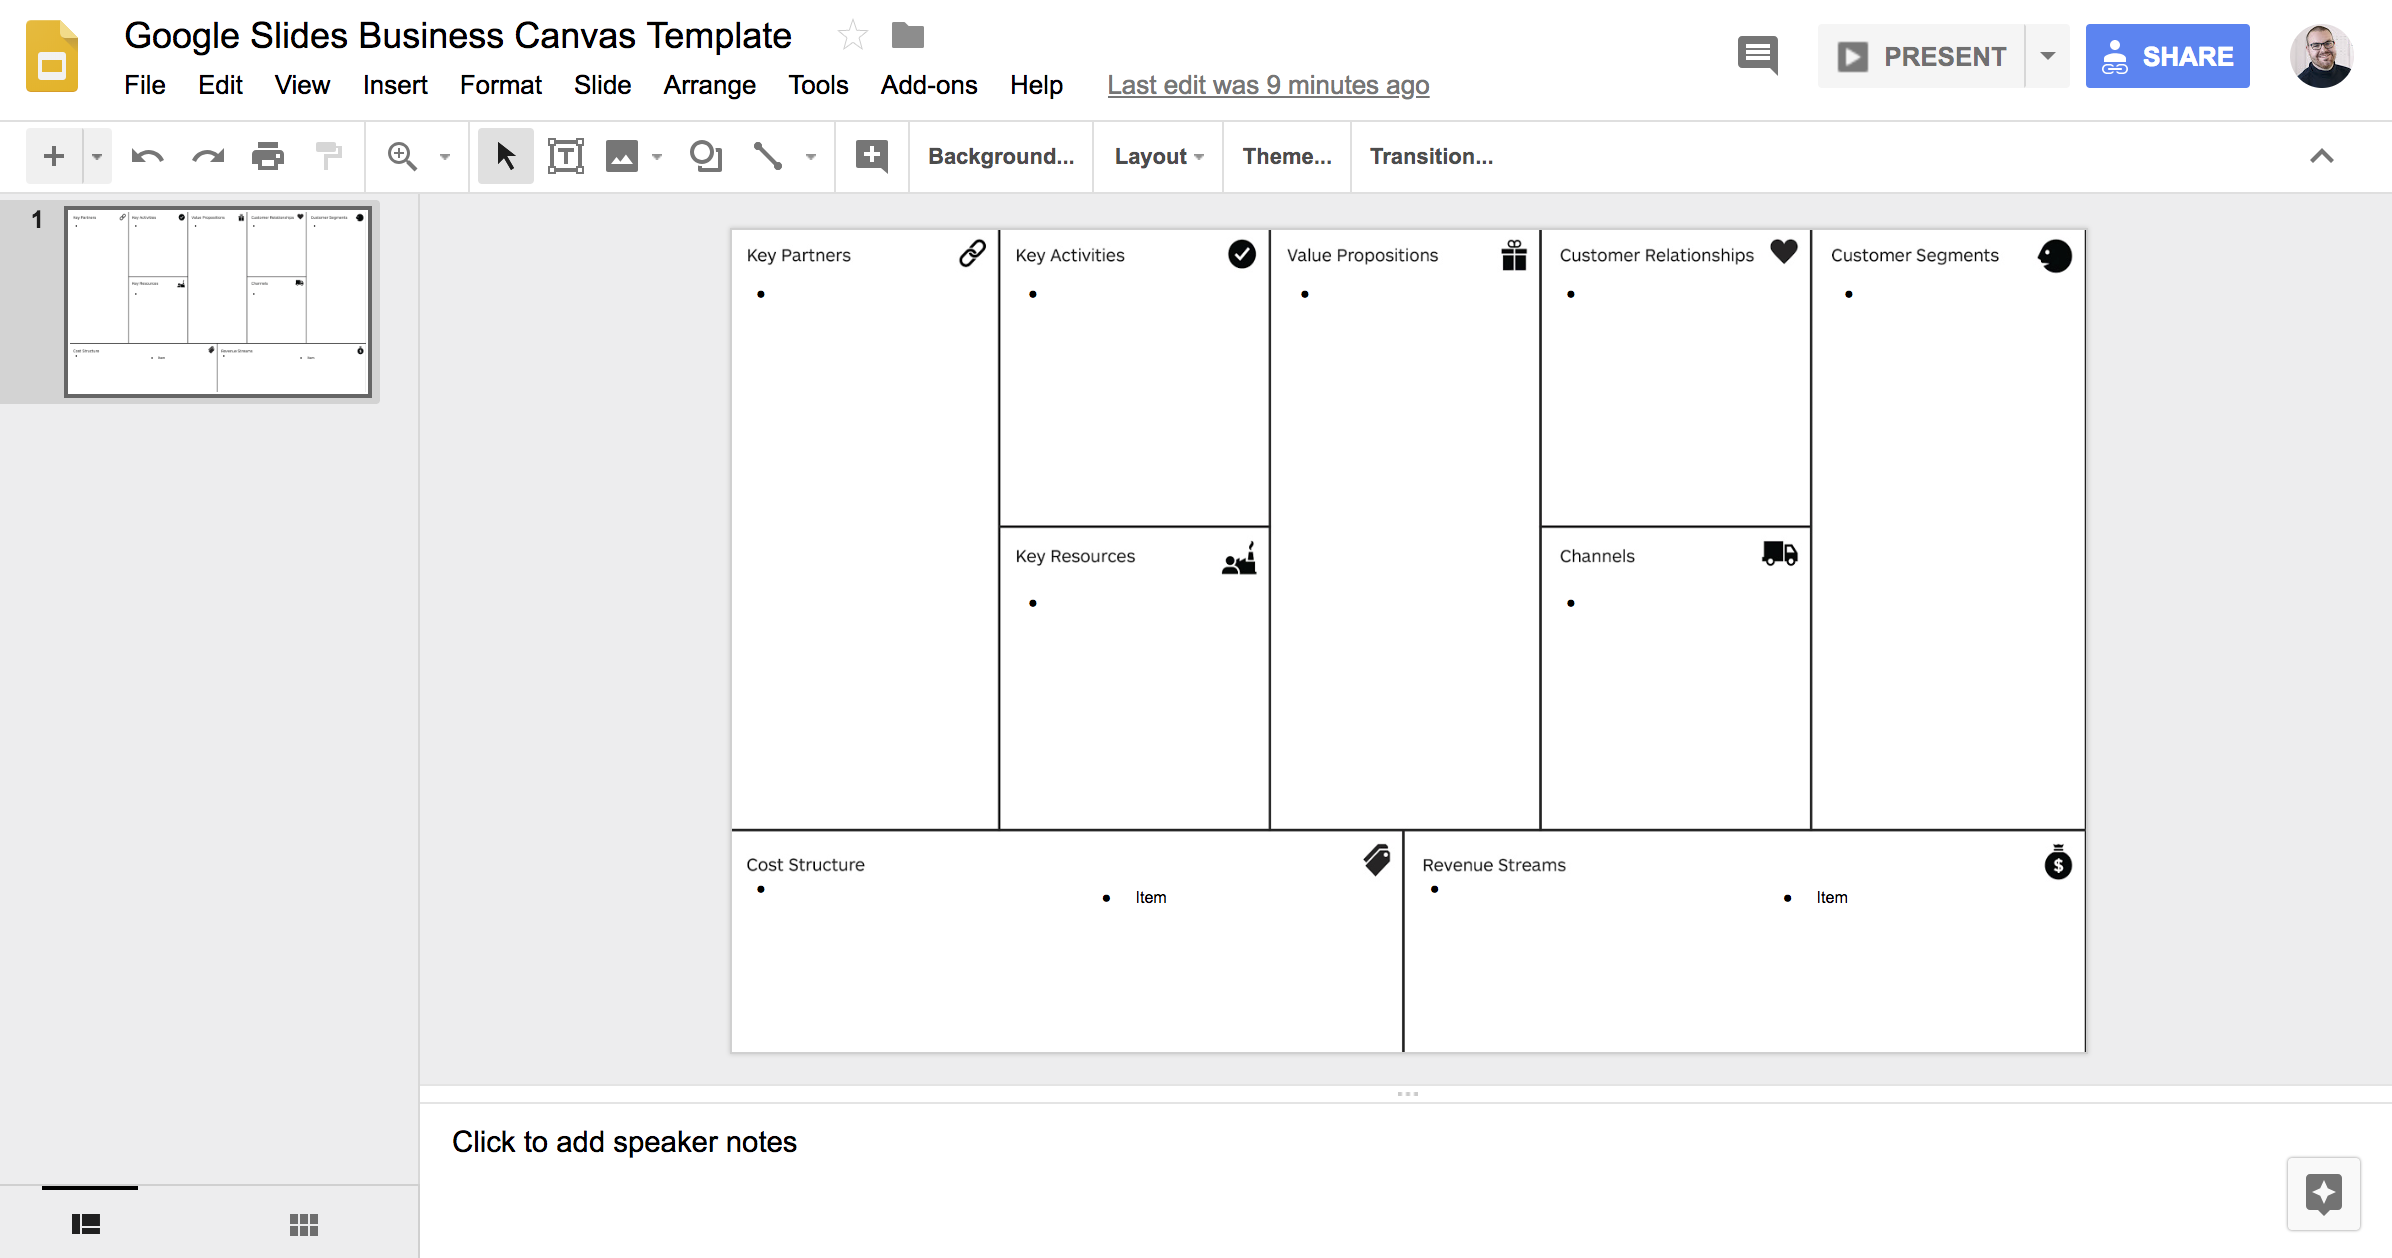 Business Canvas Tempalate Google Docs